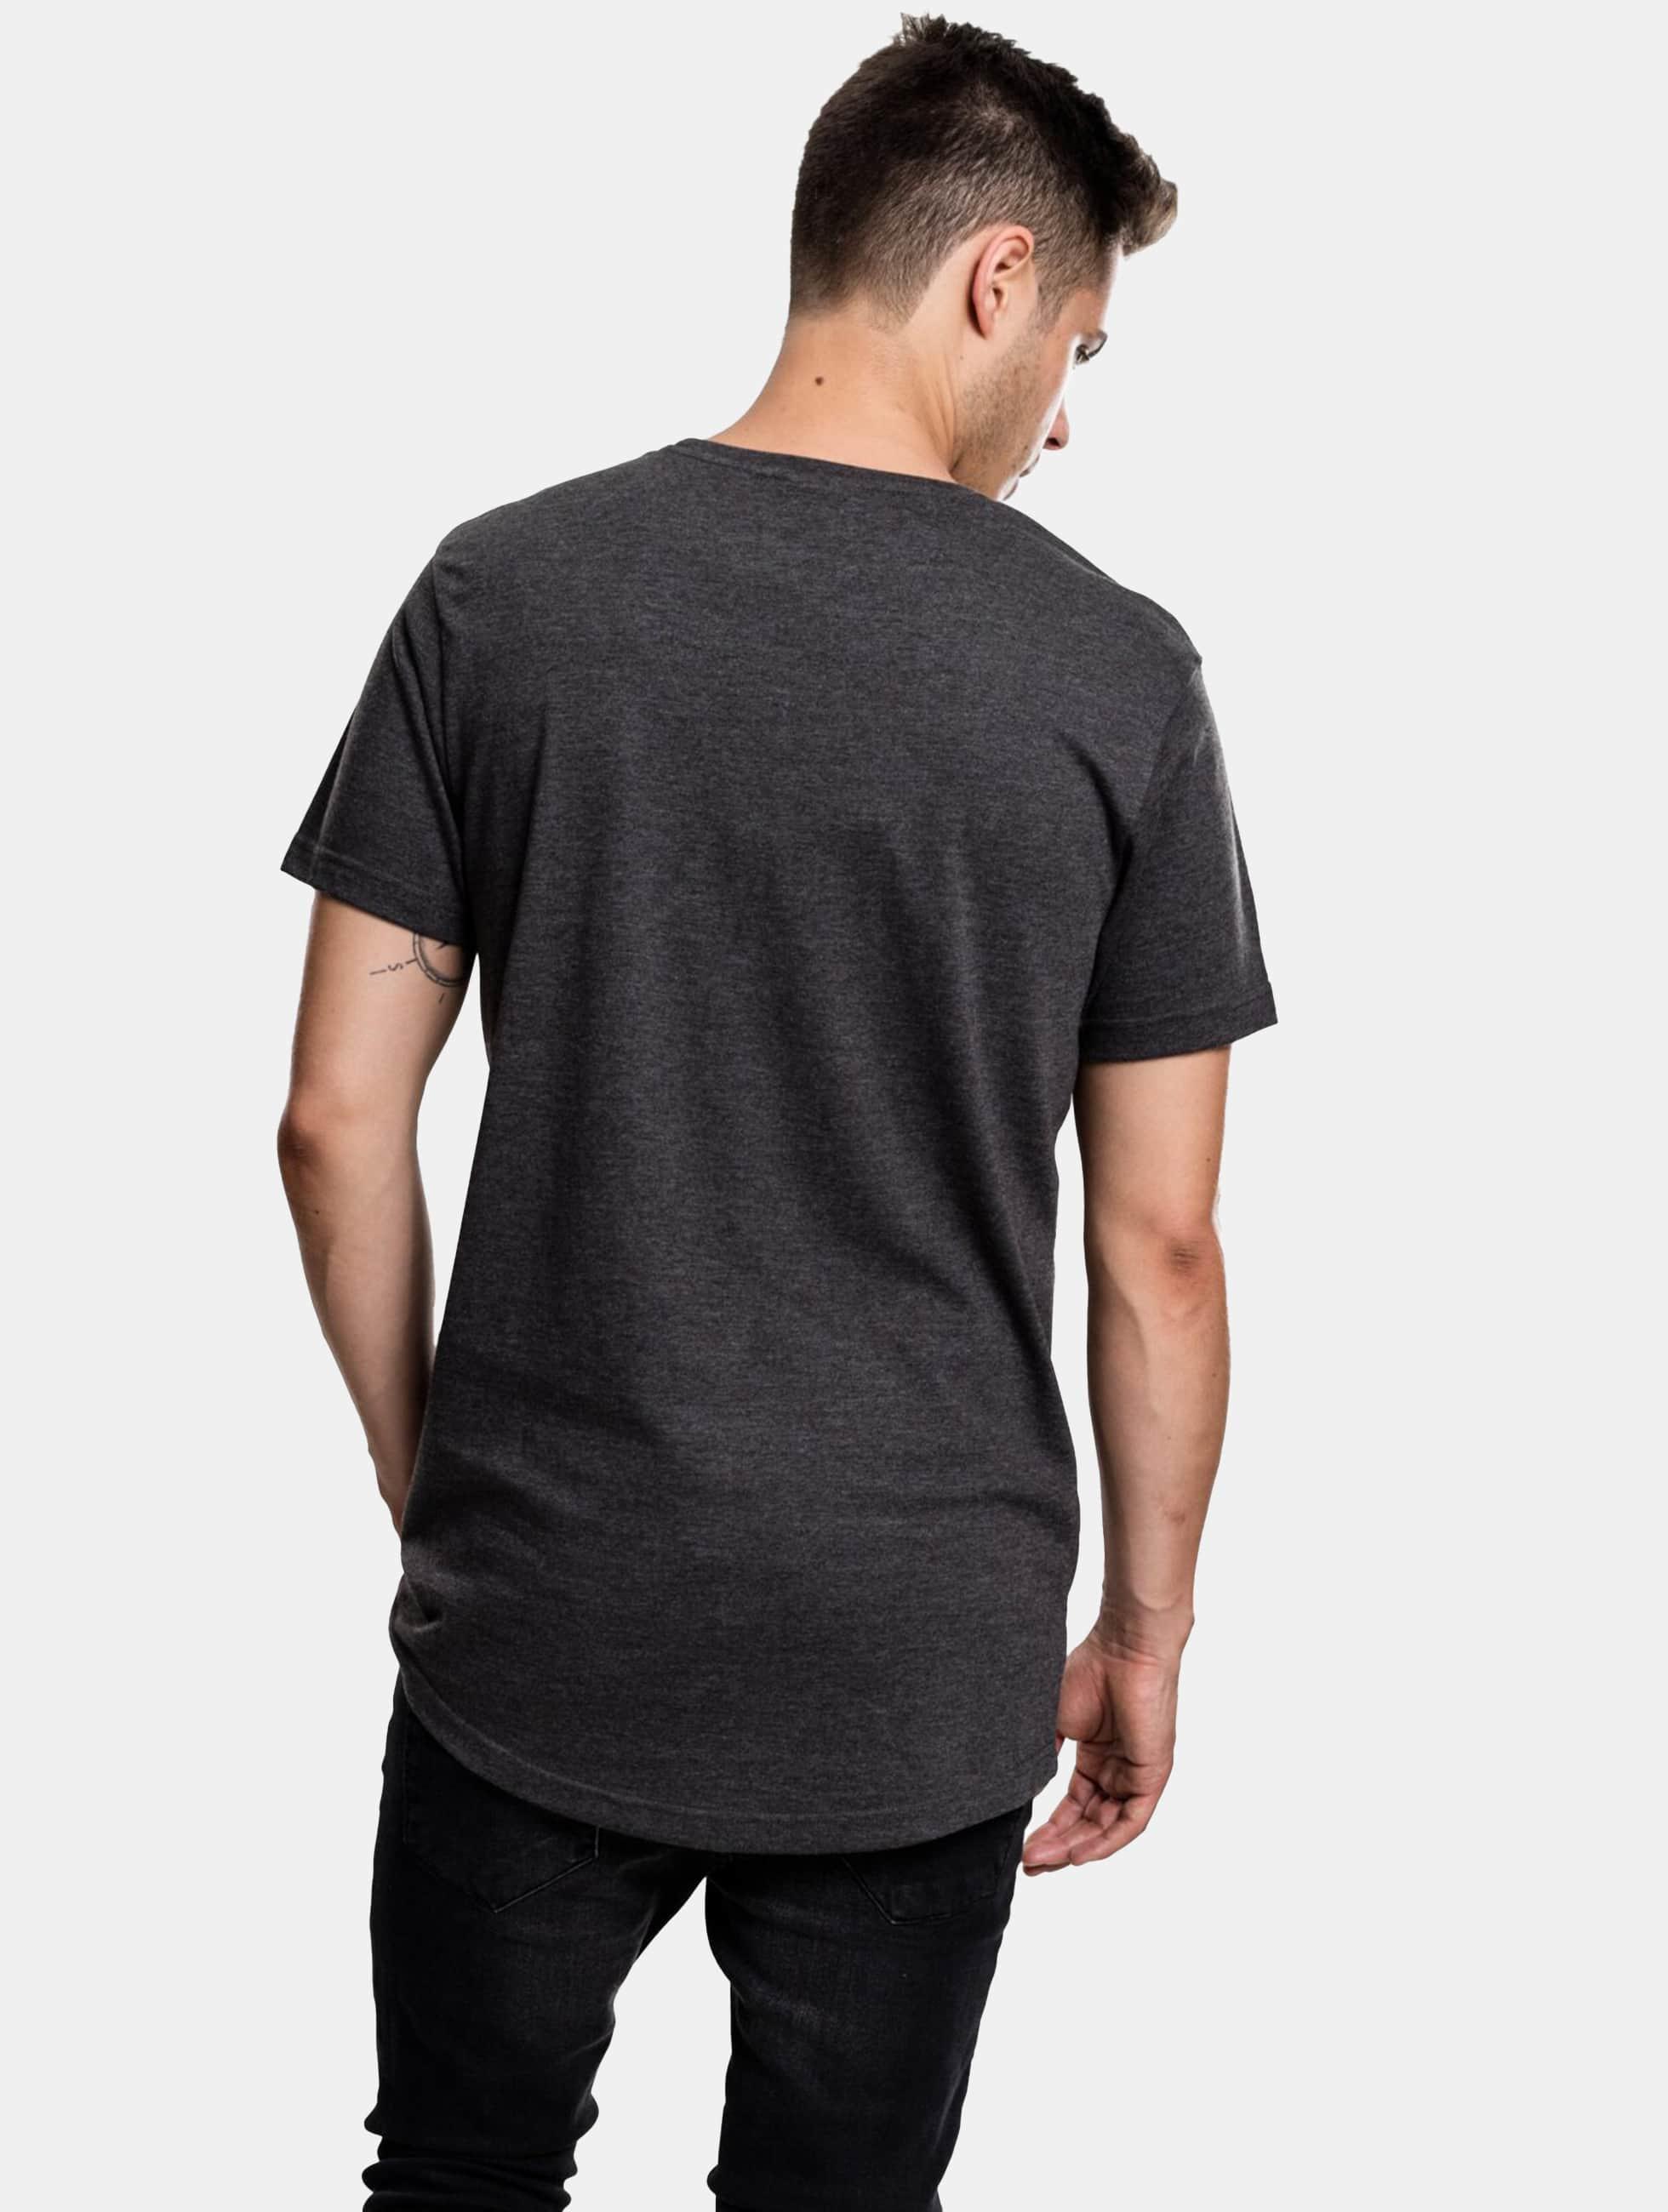 Urban Classics Tall Tees Shaped Melange Oversized Long grey